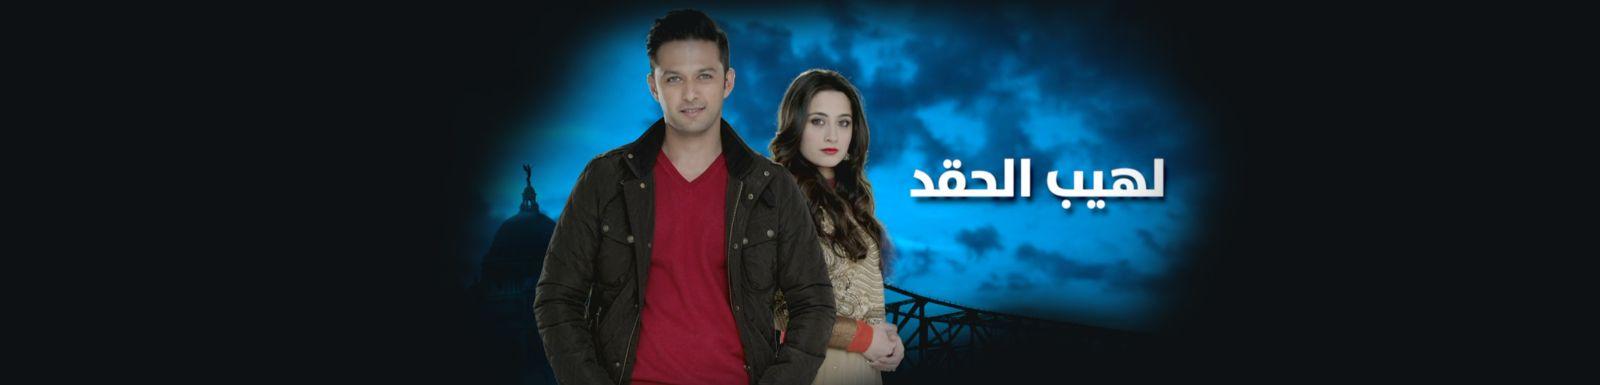 ����� ����� ���� ����� ������ 88 MBC shahid ���� ��